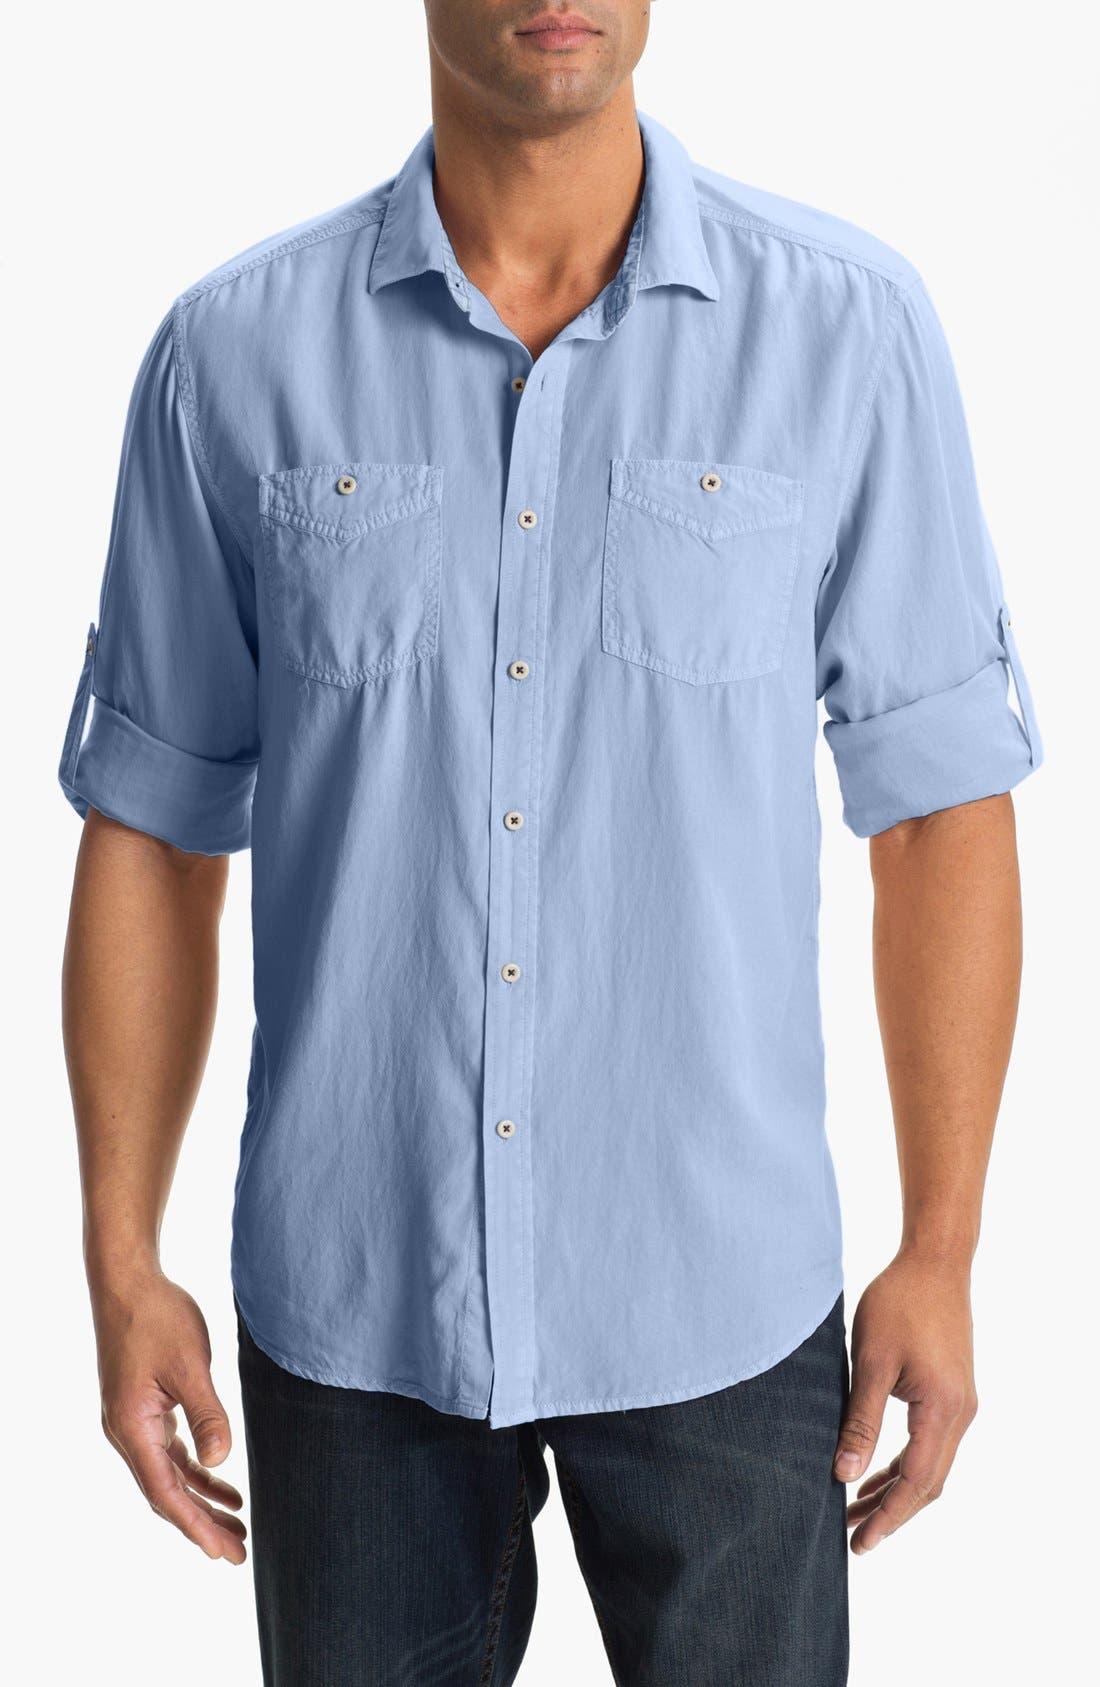 Main Image - Tommy Bahama 'Sand City' Sport Shirt (Big & Tall)